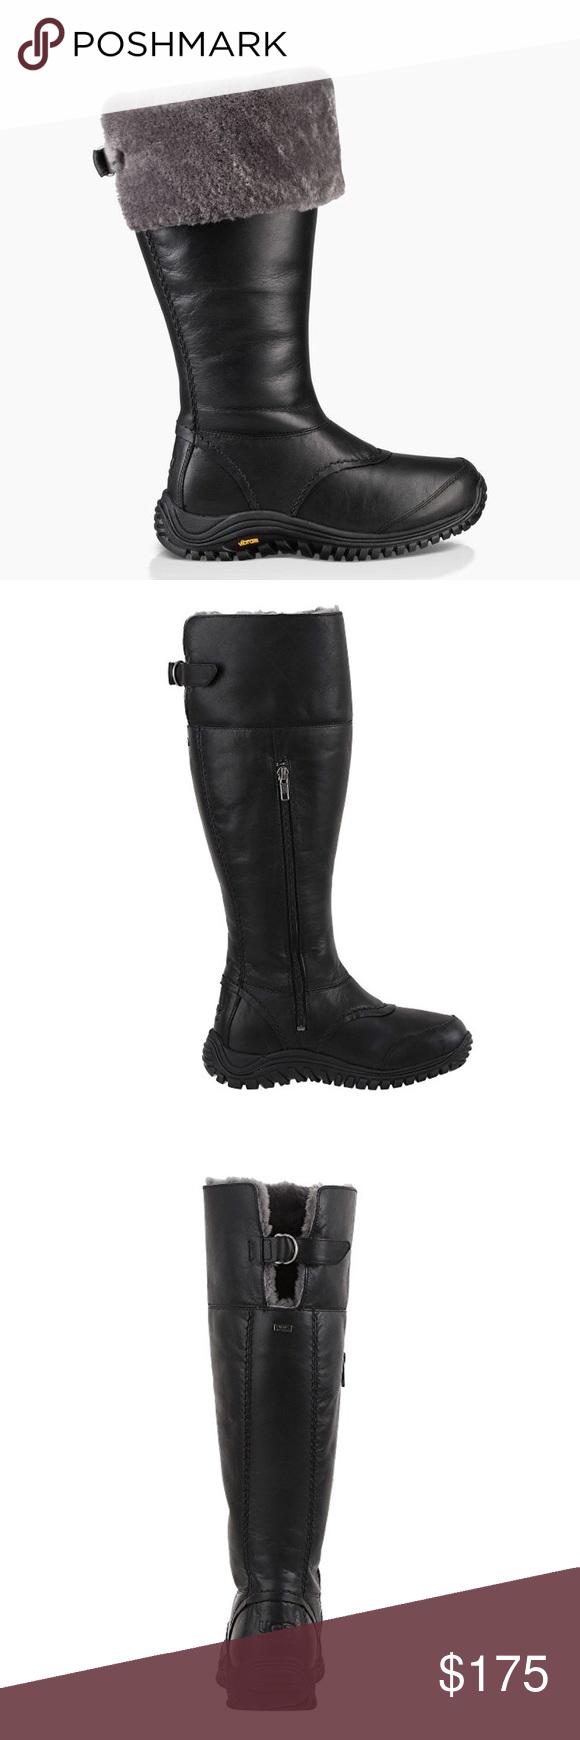 Waterproof Miko Tall Snow Boots